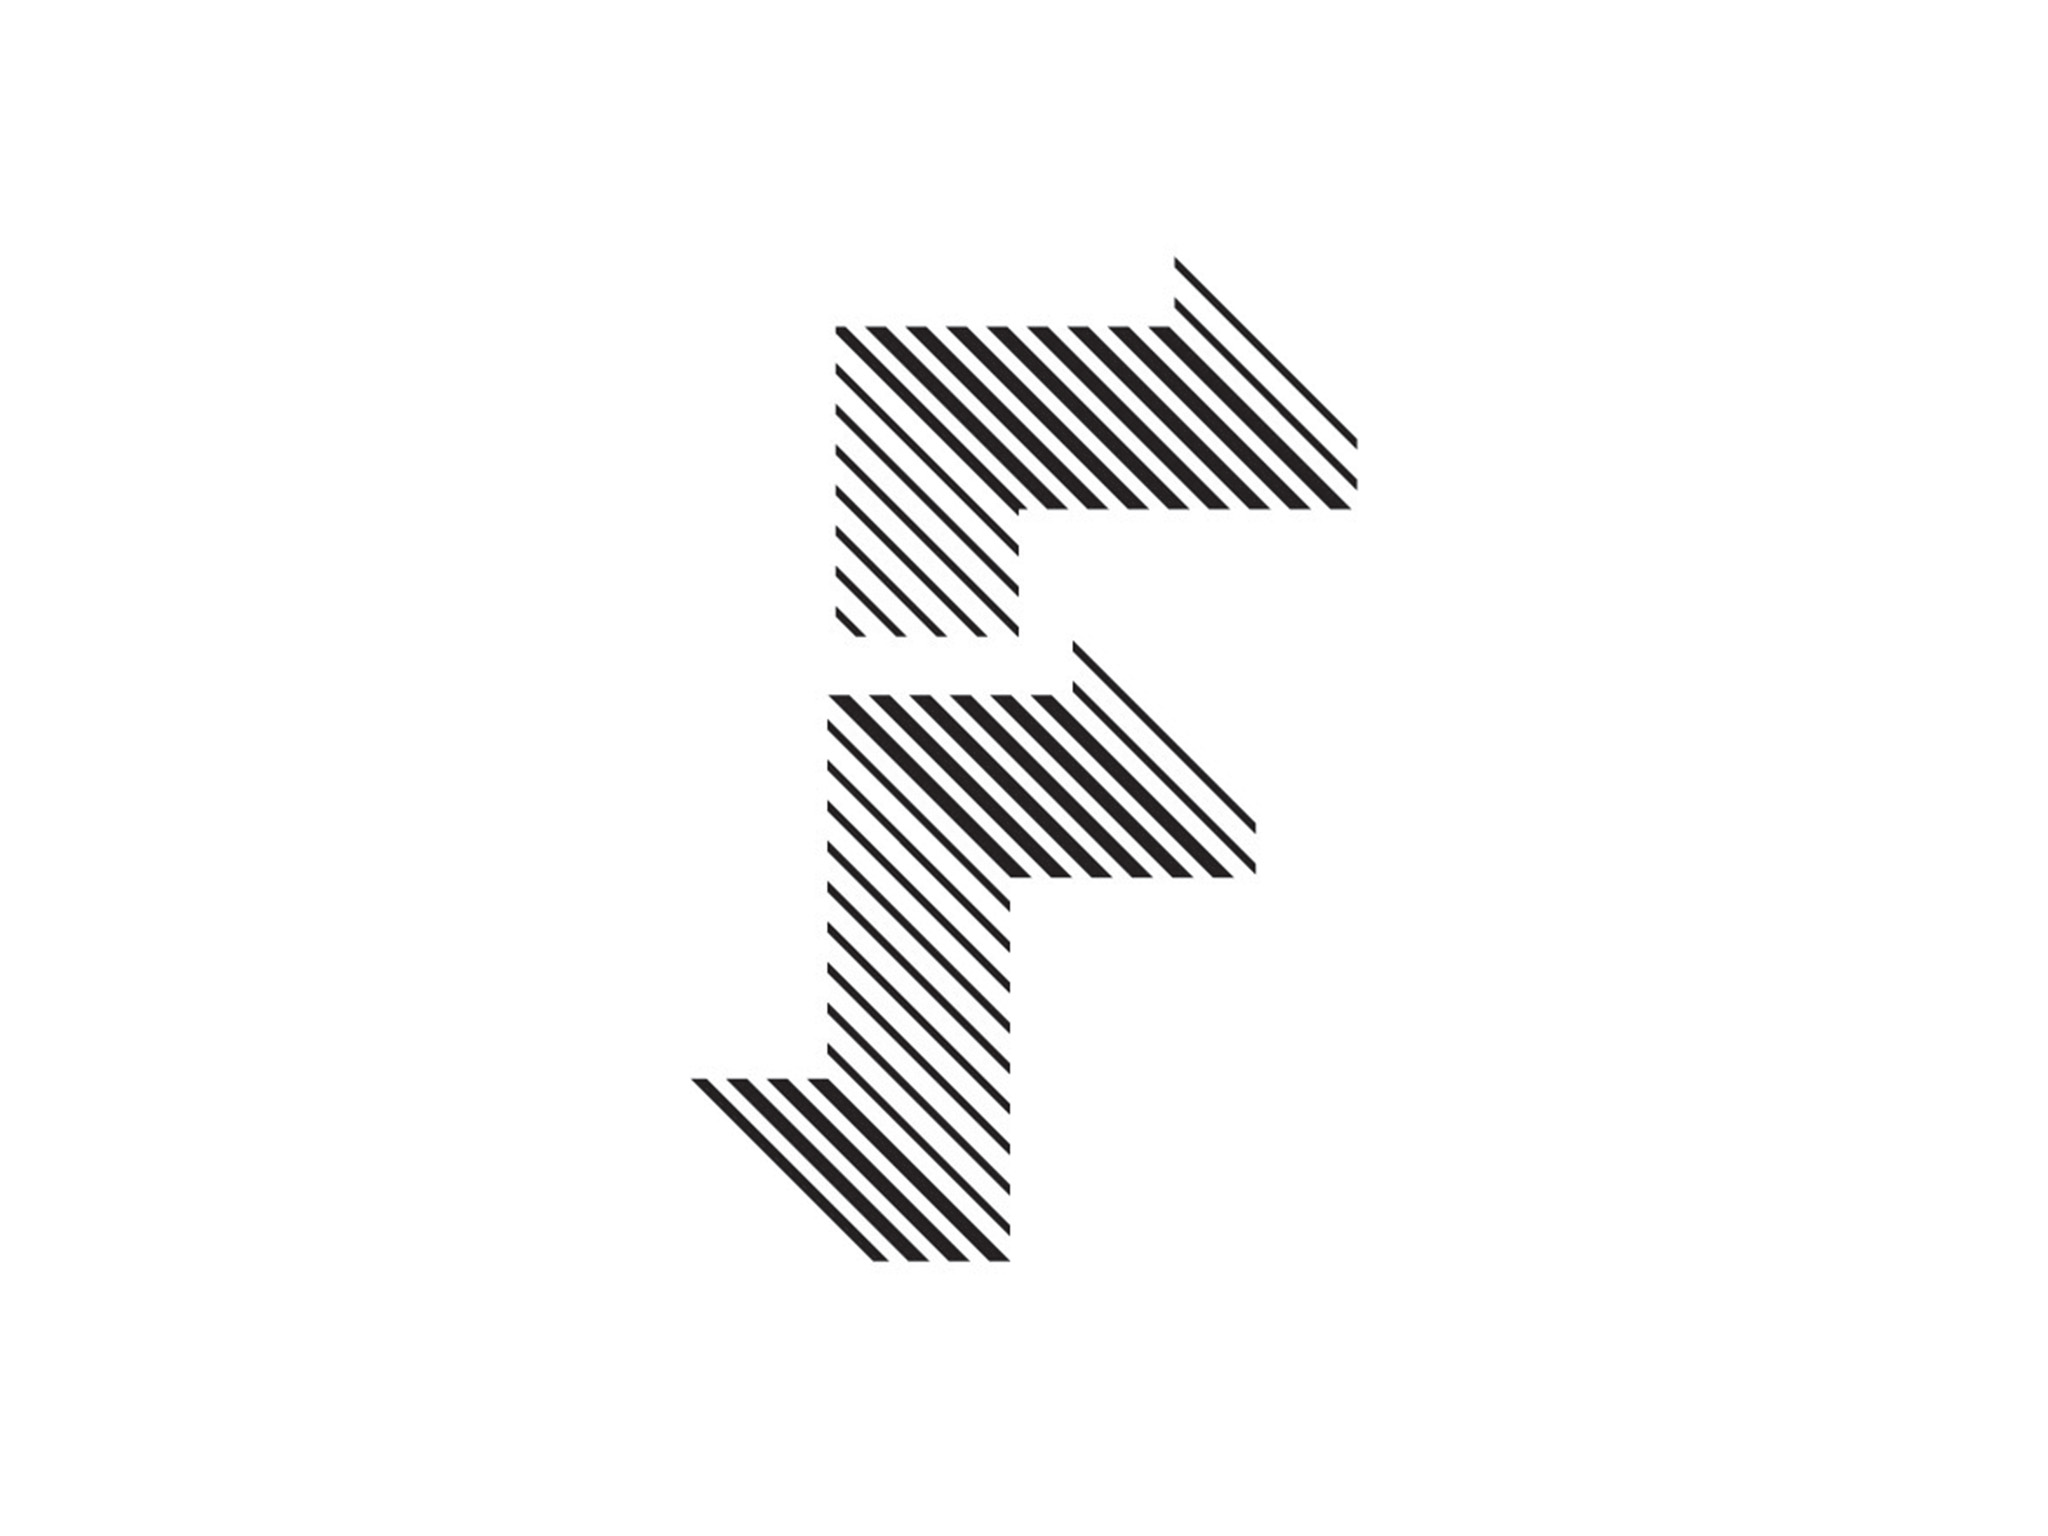 apex_letters_horizontal_large_0016_2_final_alphabet coasters-06.jpg